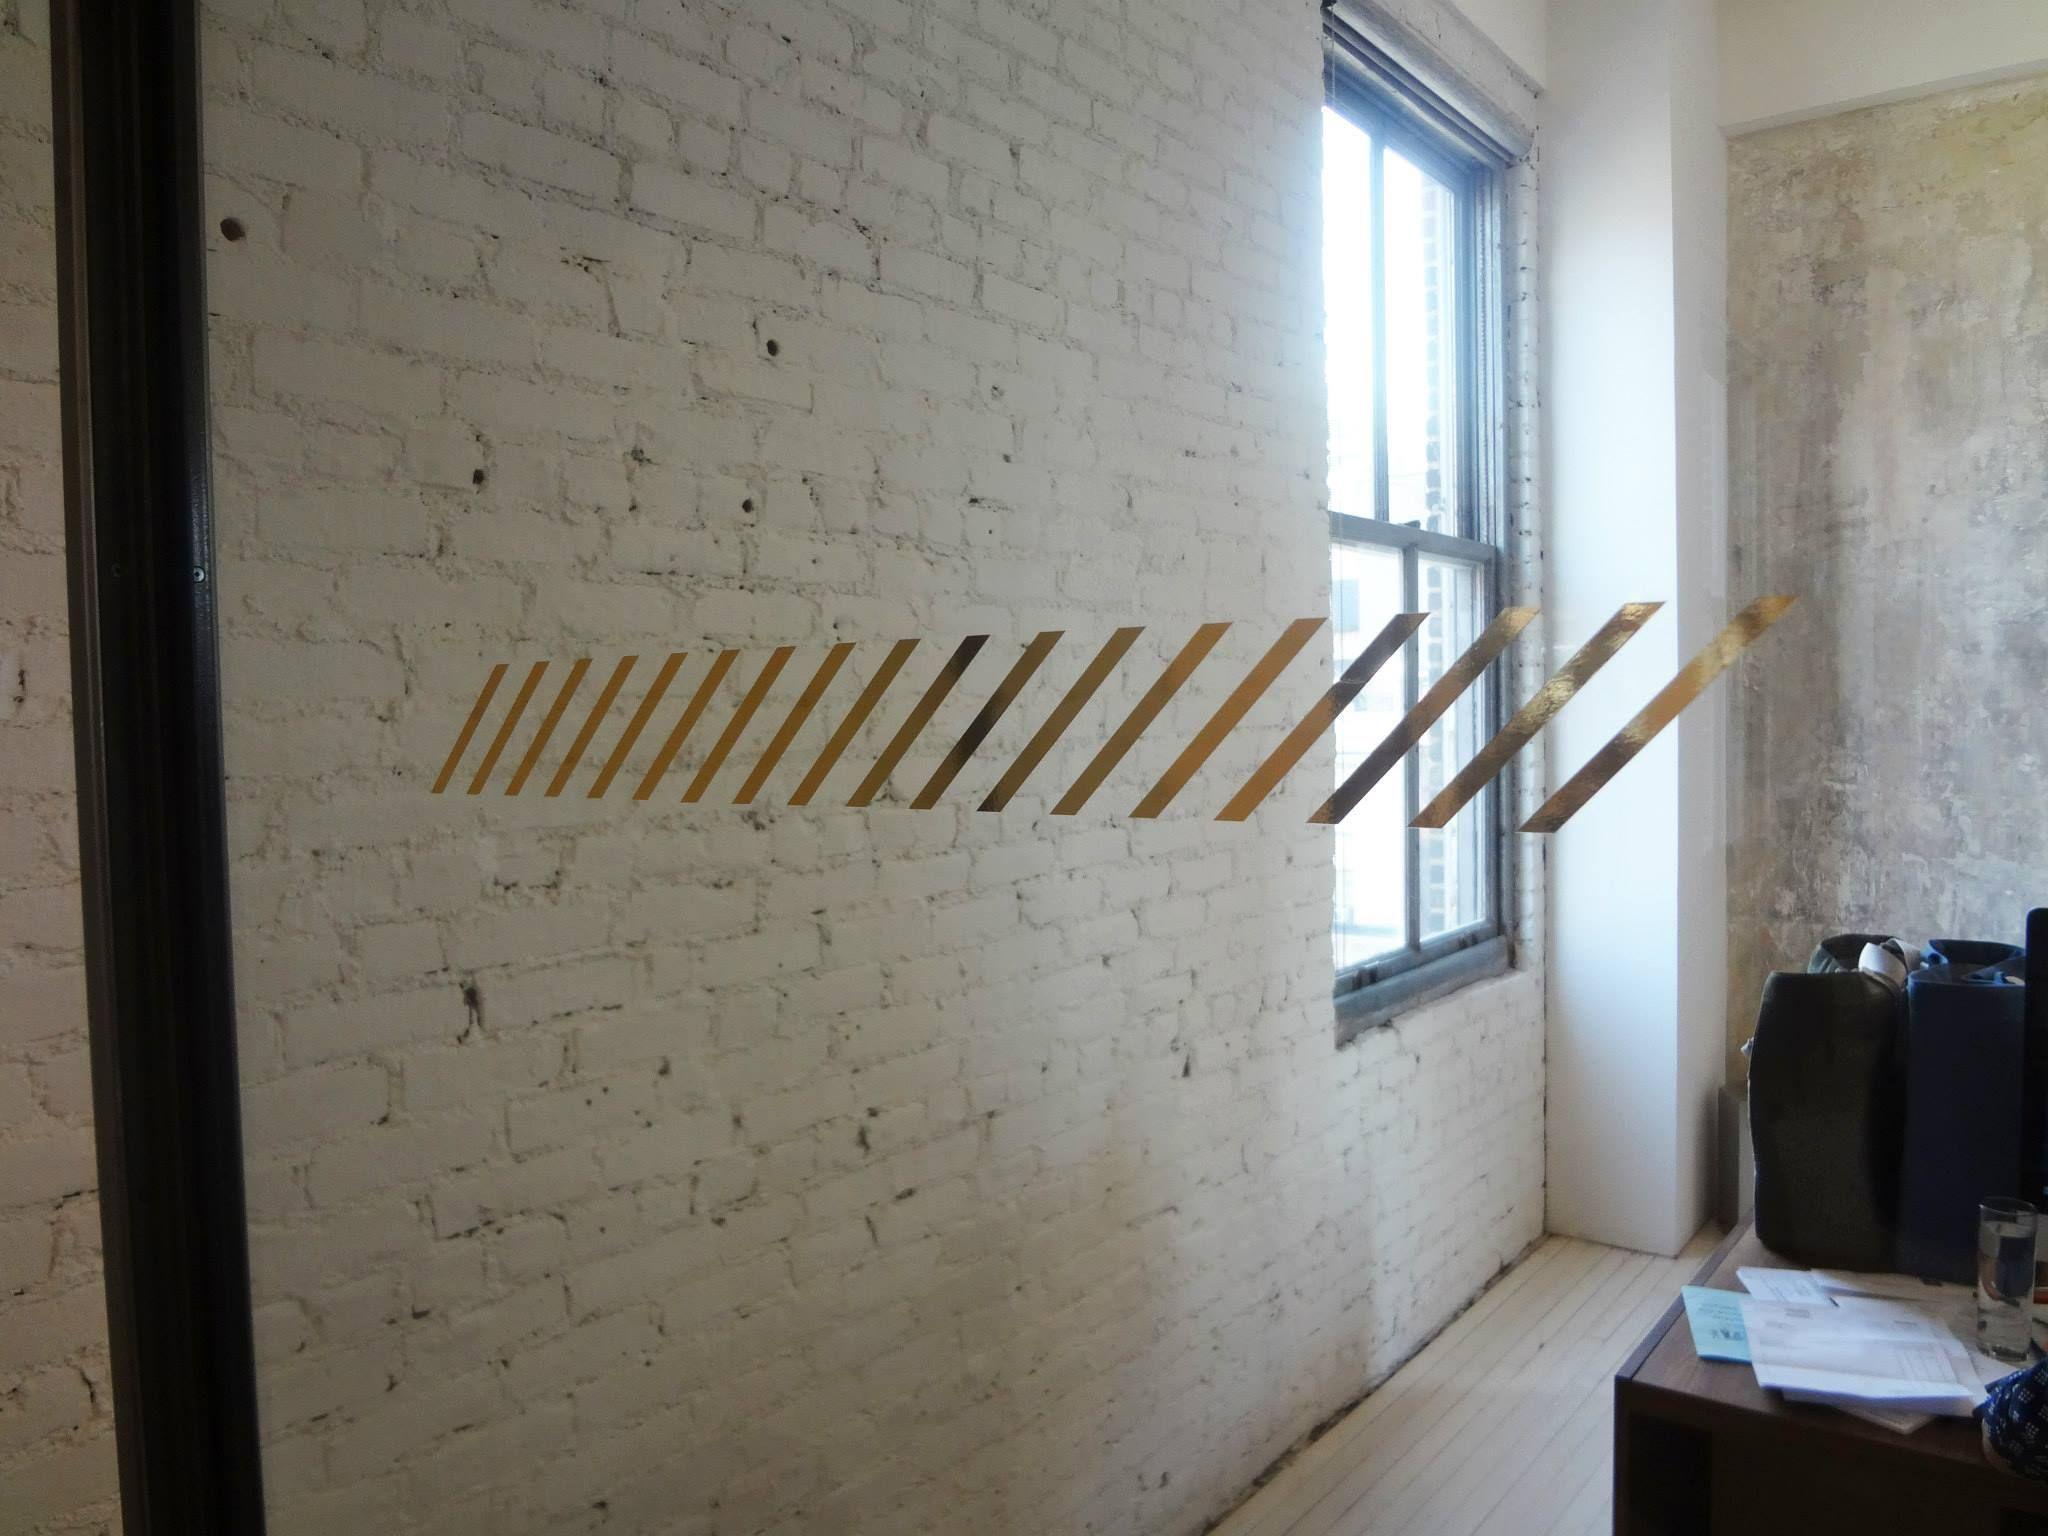 Best Custom Vinyl Signage NYC Images On Pinterest - Custom vinyl decals for wood